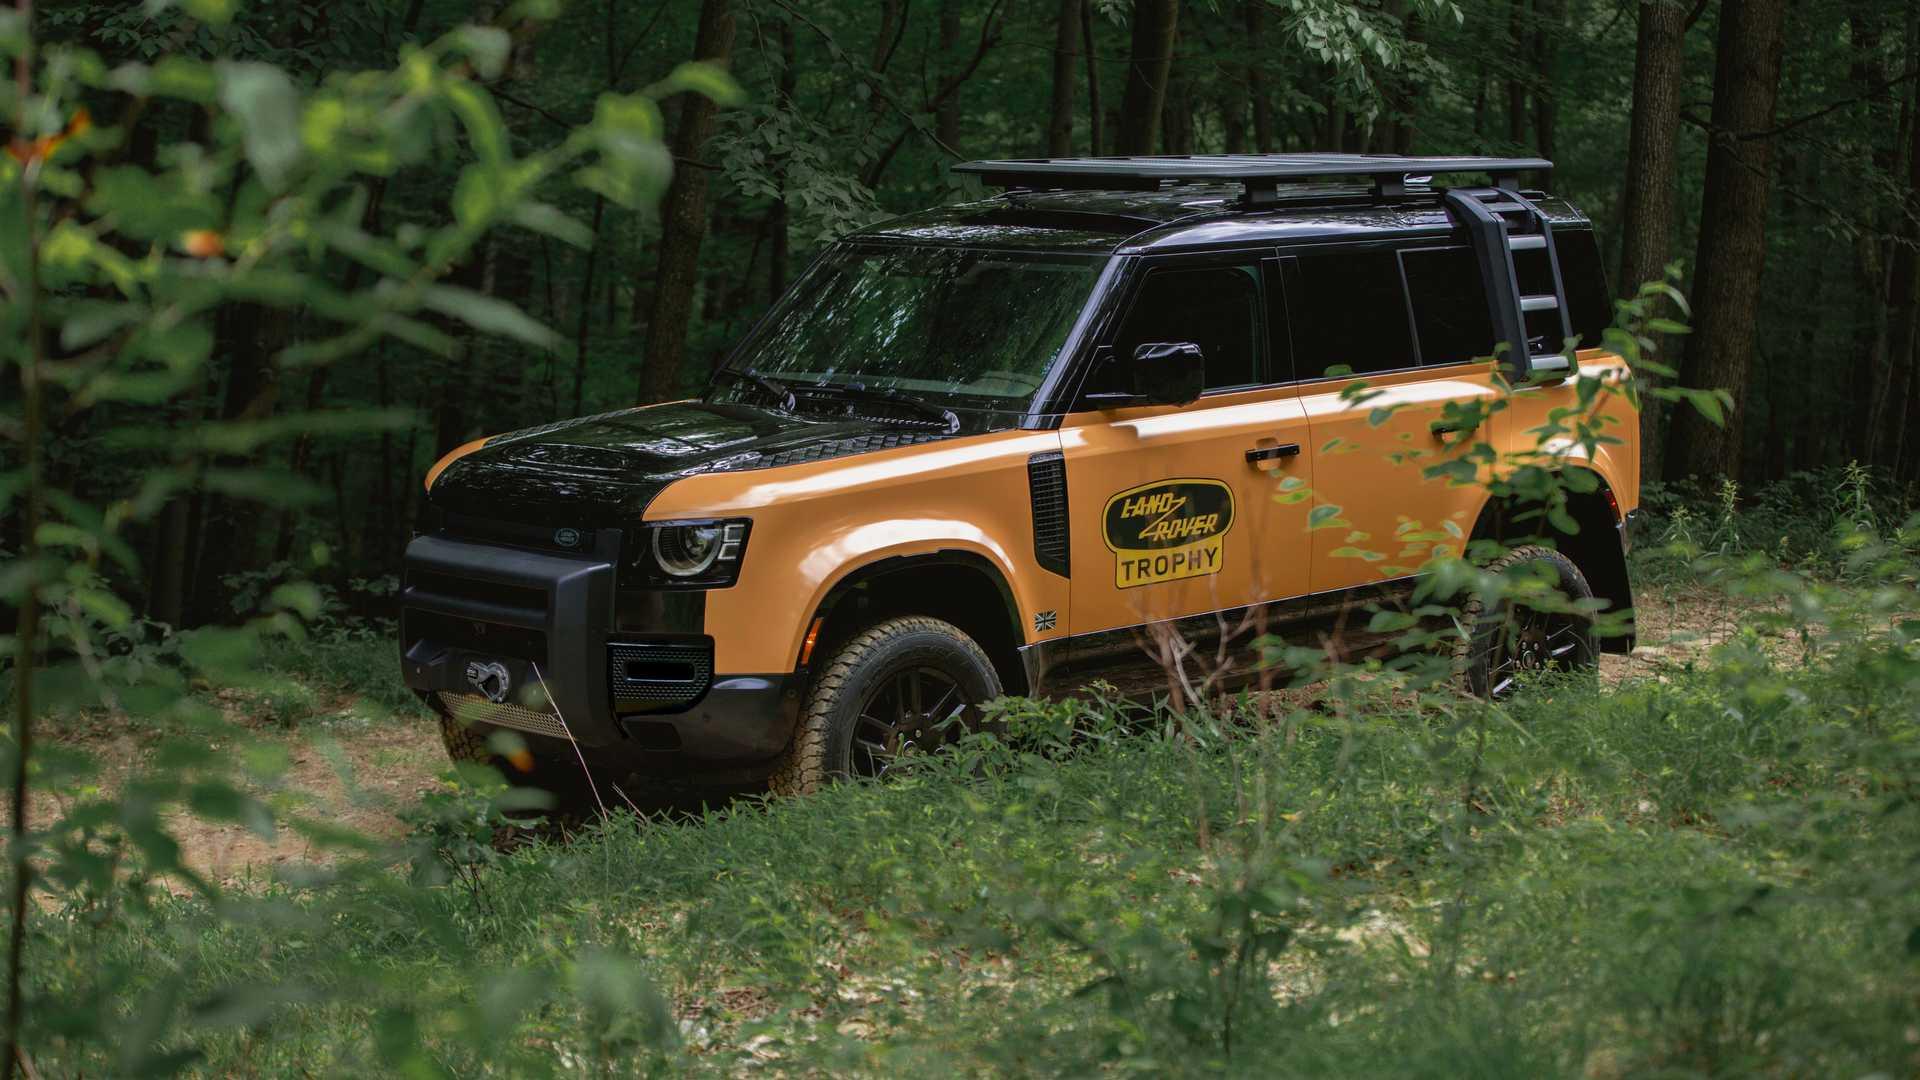 Land-Rover-Defender-Trophy-Edition-9